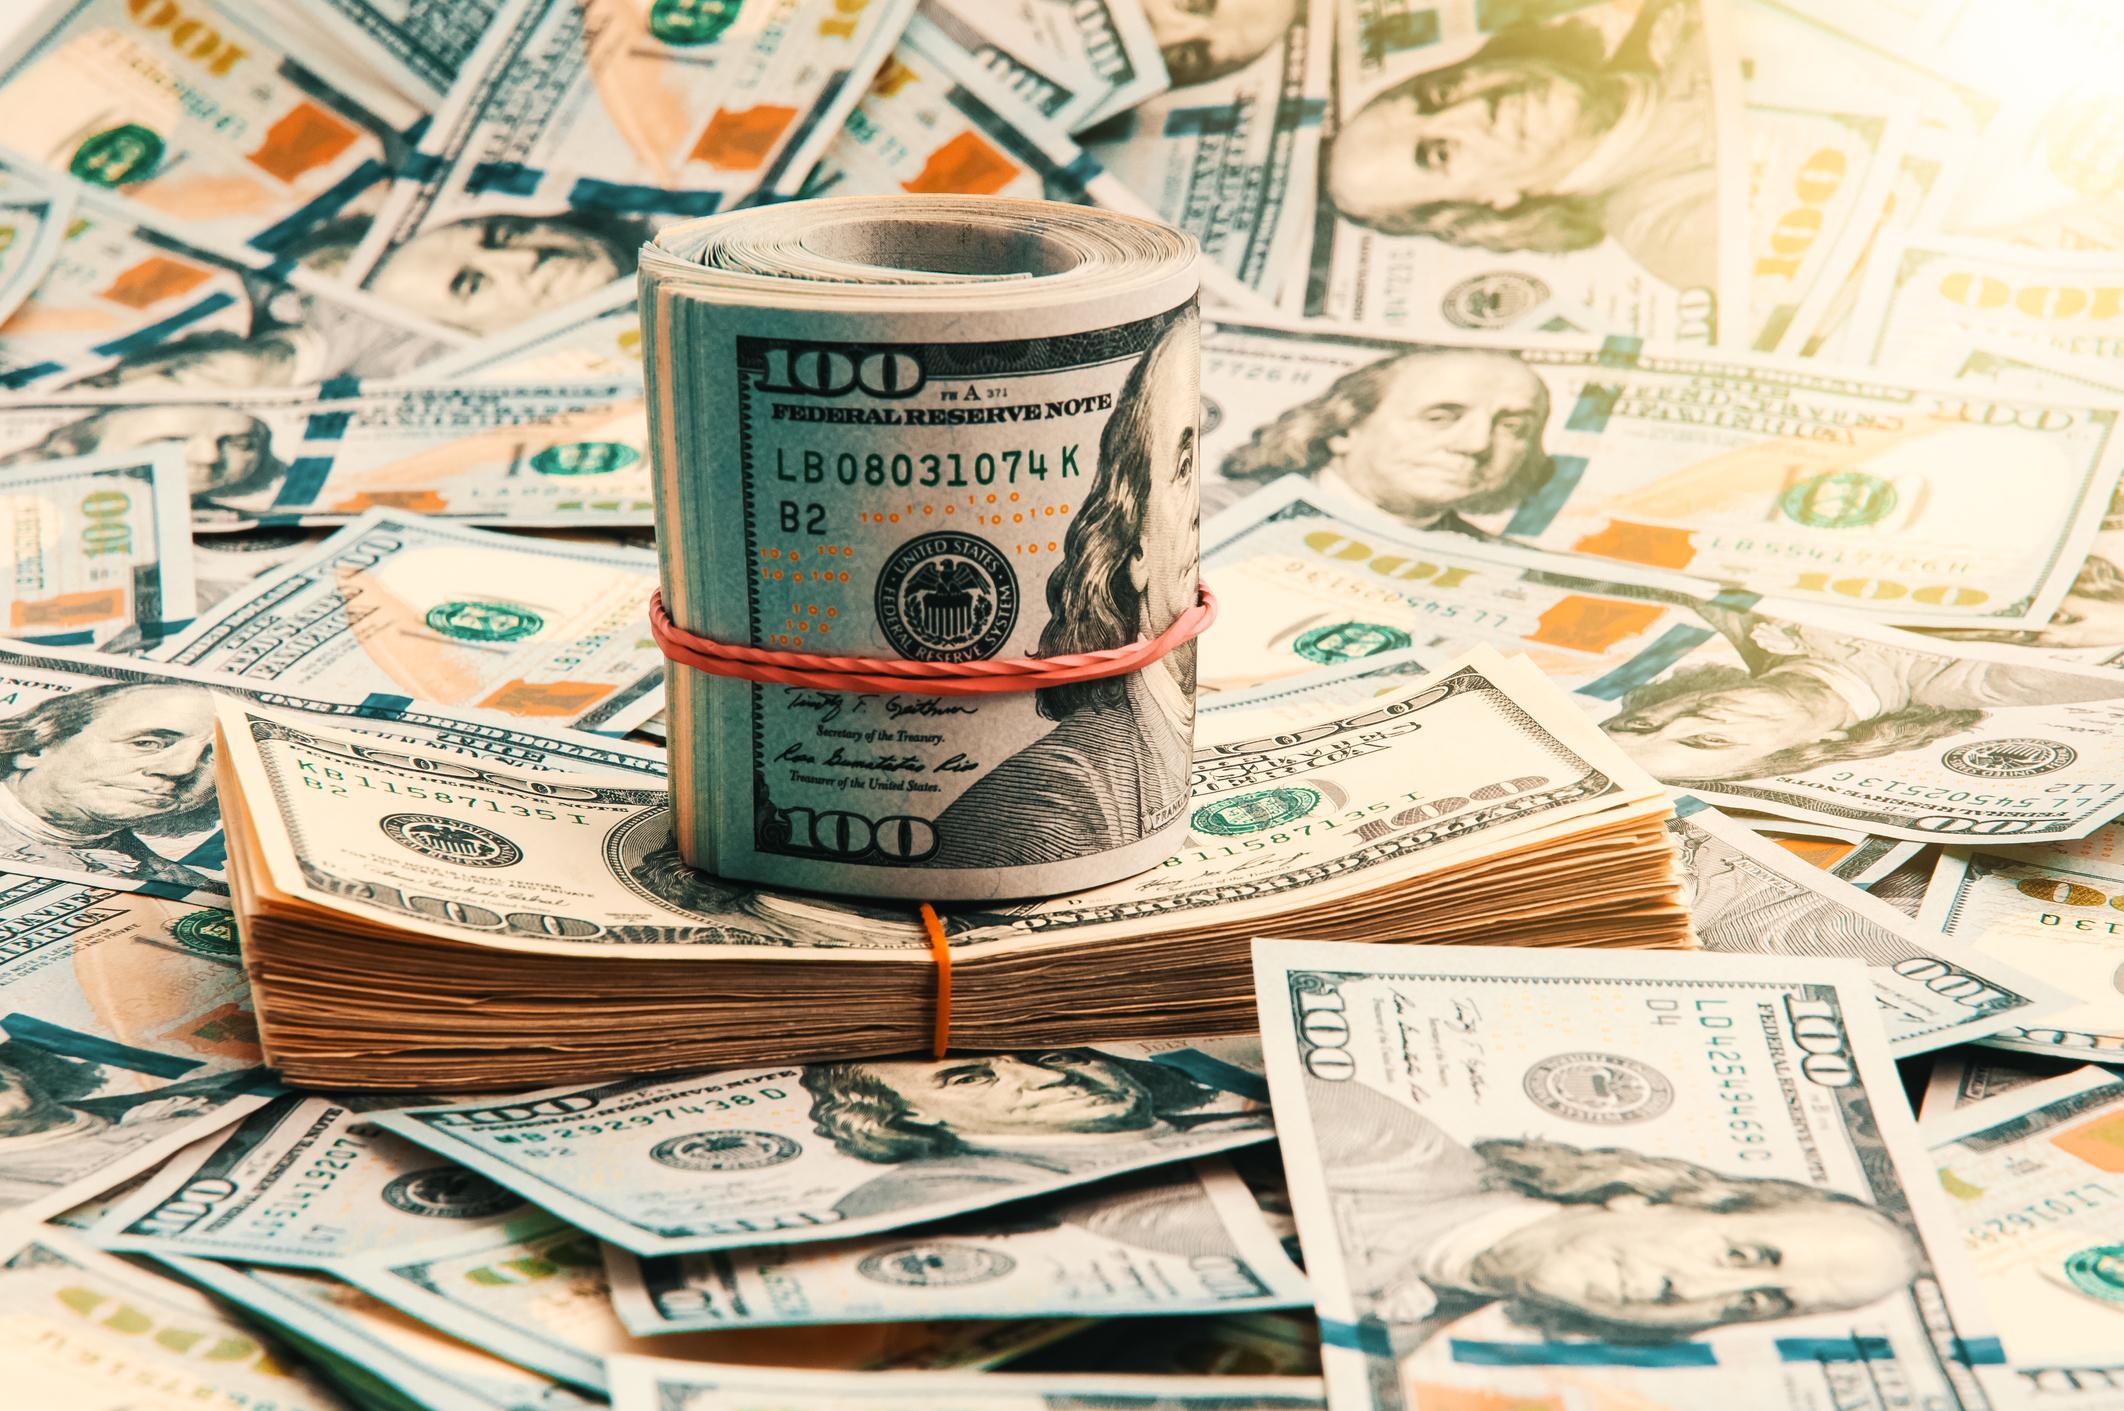 How to Transfer Stock Into an IRA | Finance - Zacks